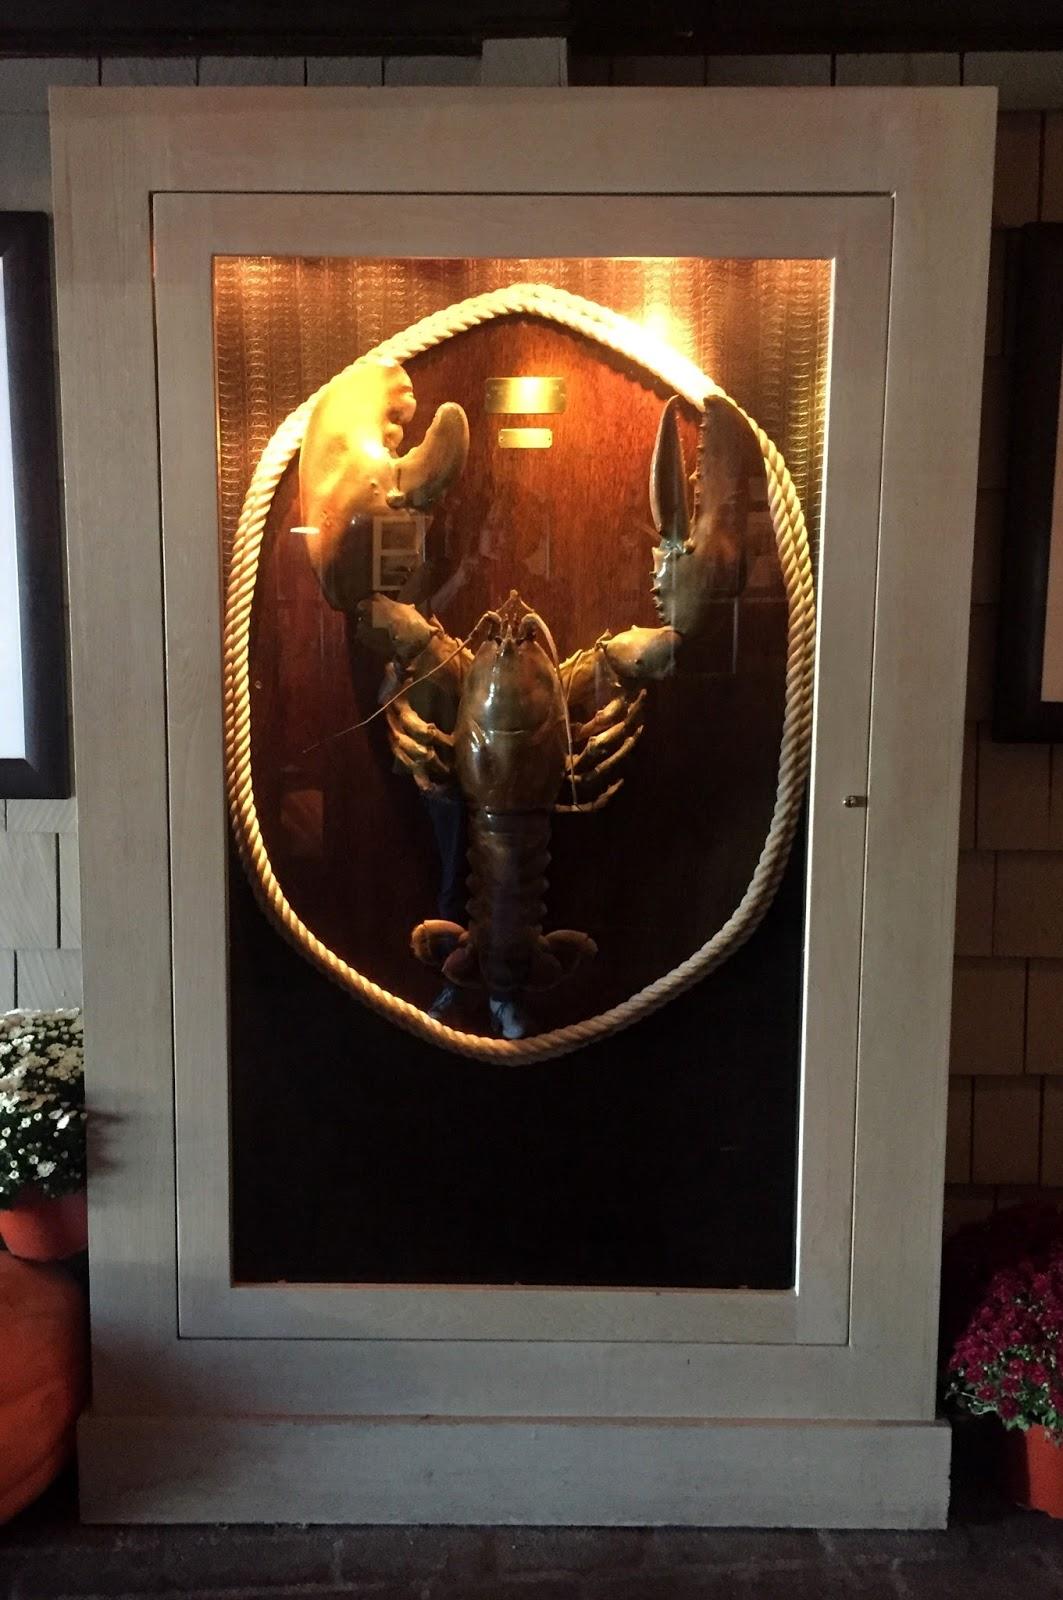 Lobster house wildwood nj menu best lobster 2017 for Lobster house fish market